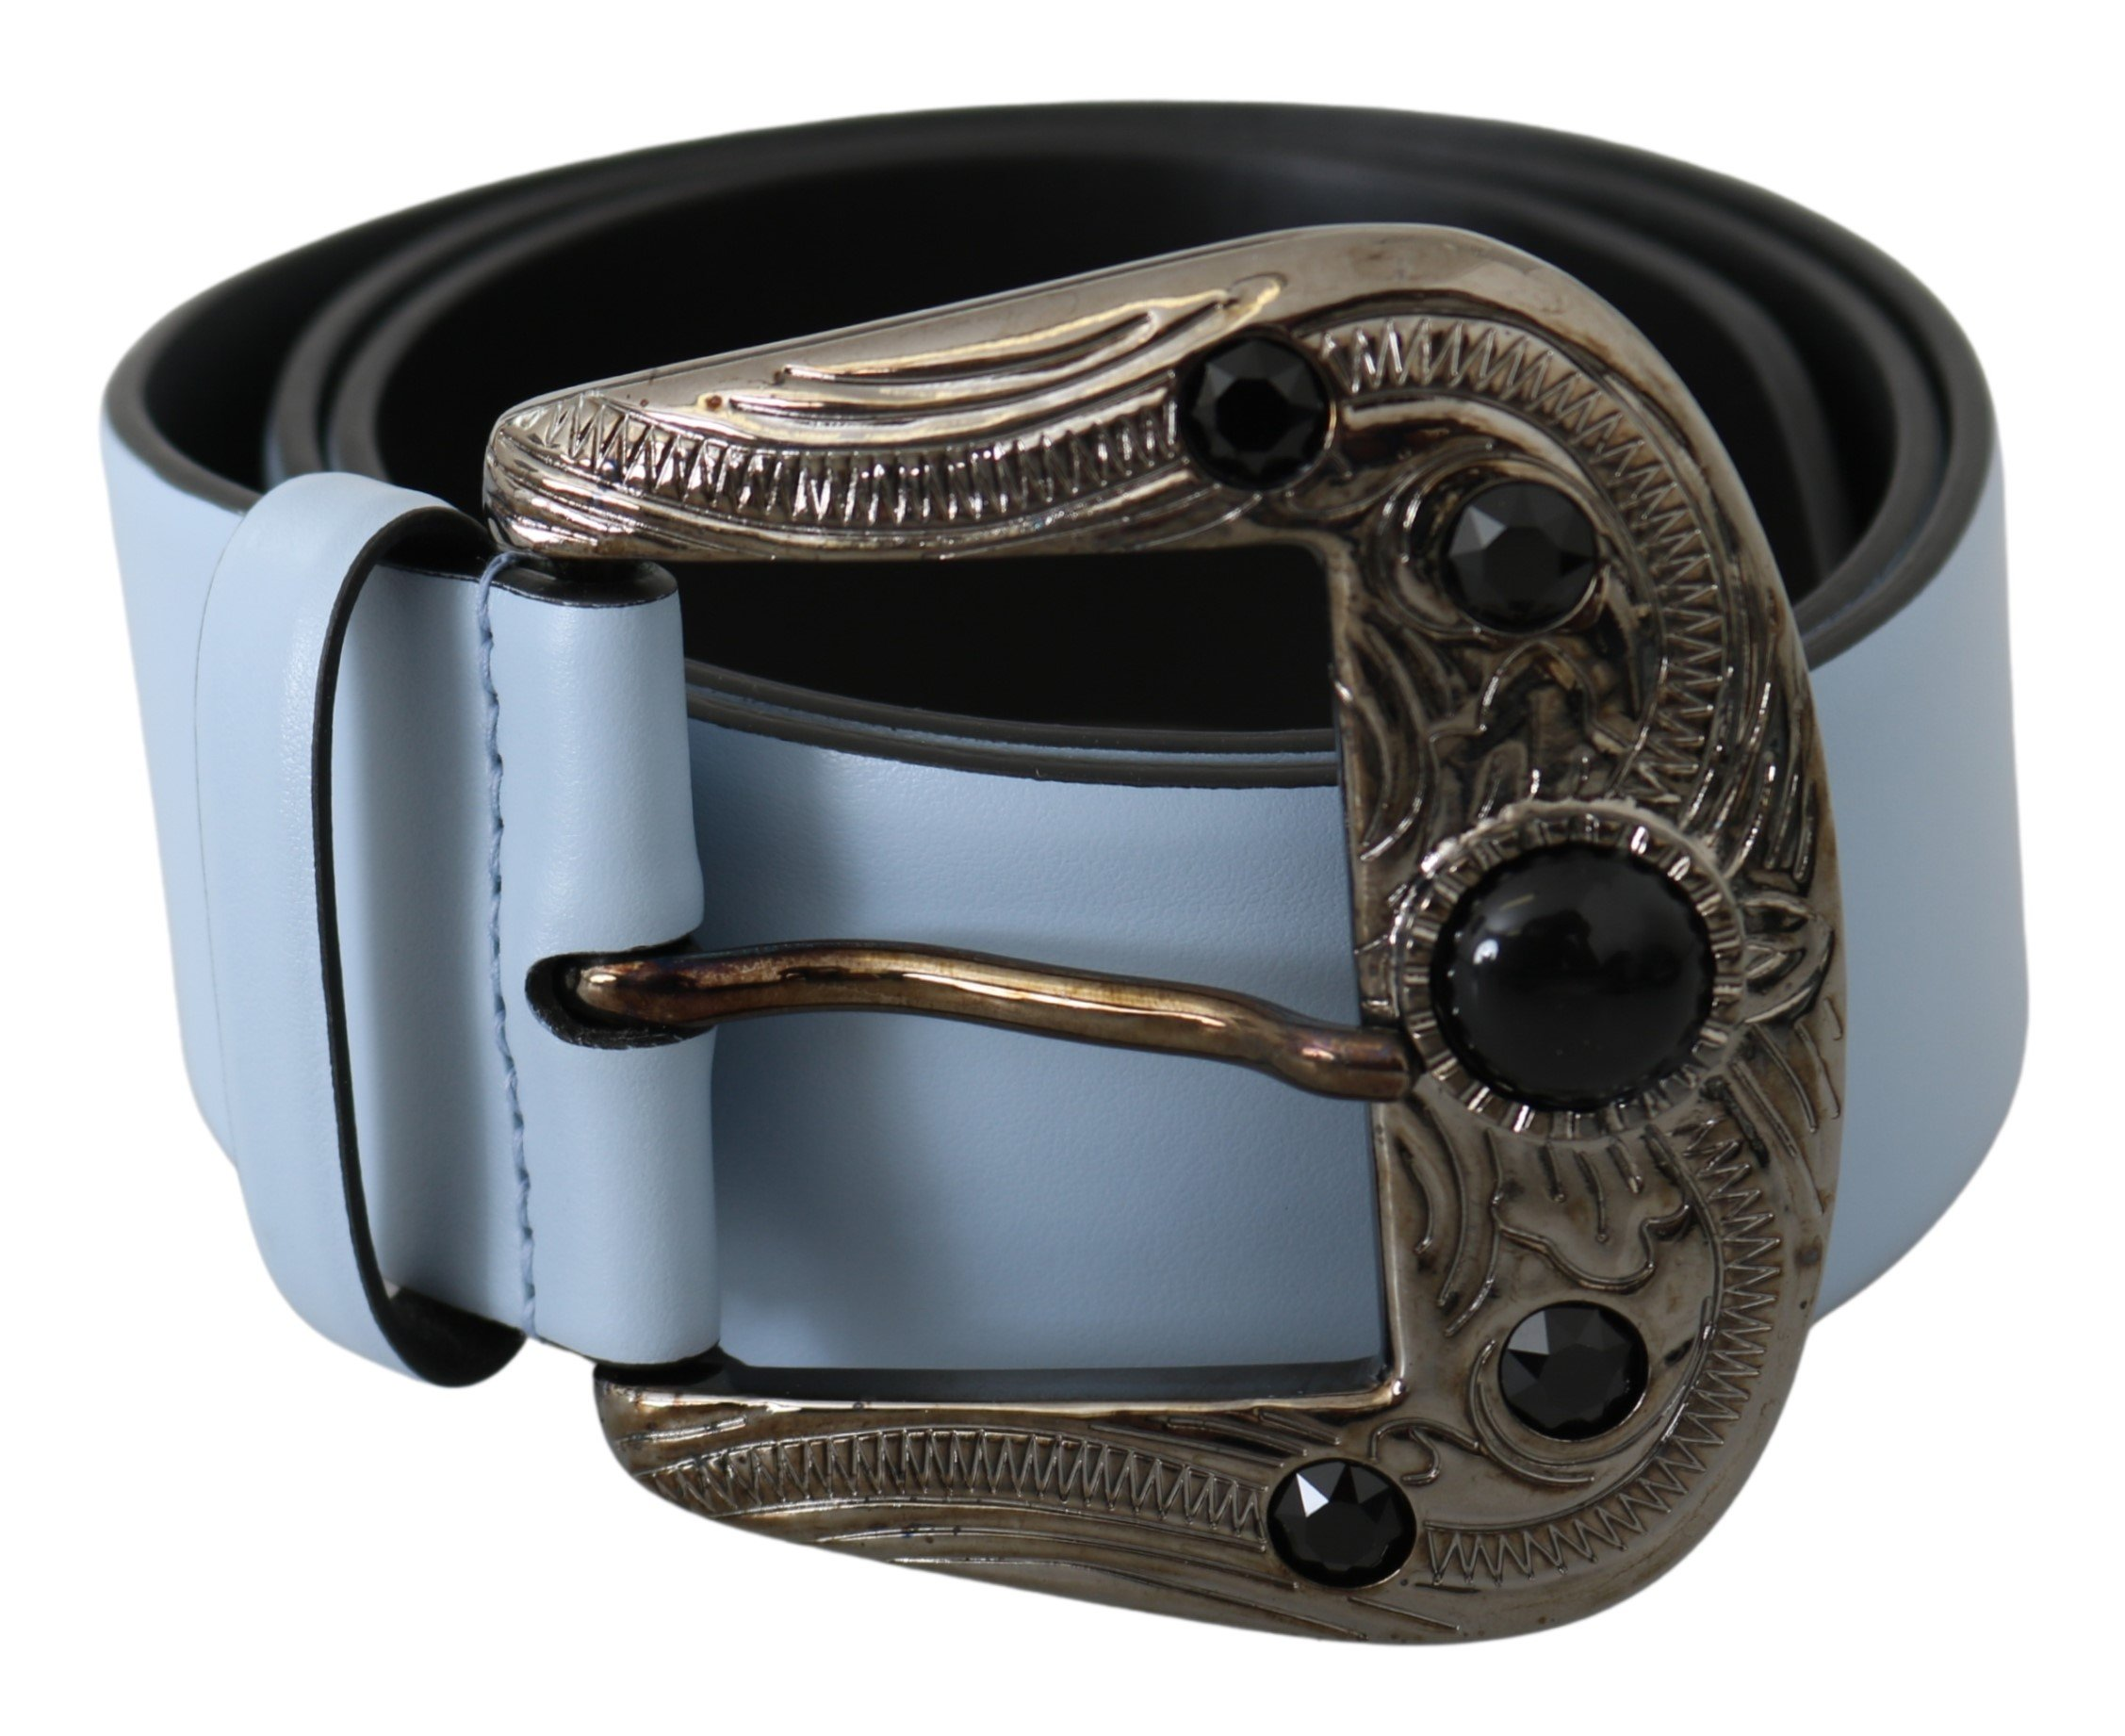 Dolce & Gabbana Women's Pearl Buckle Leather Belt Blue BEL60767 - 90 cm / 36 Inches